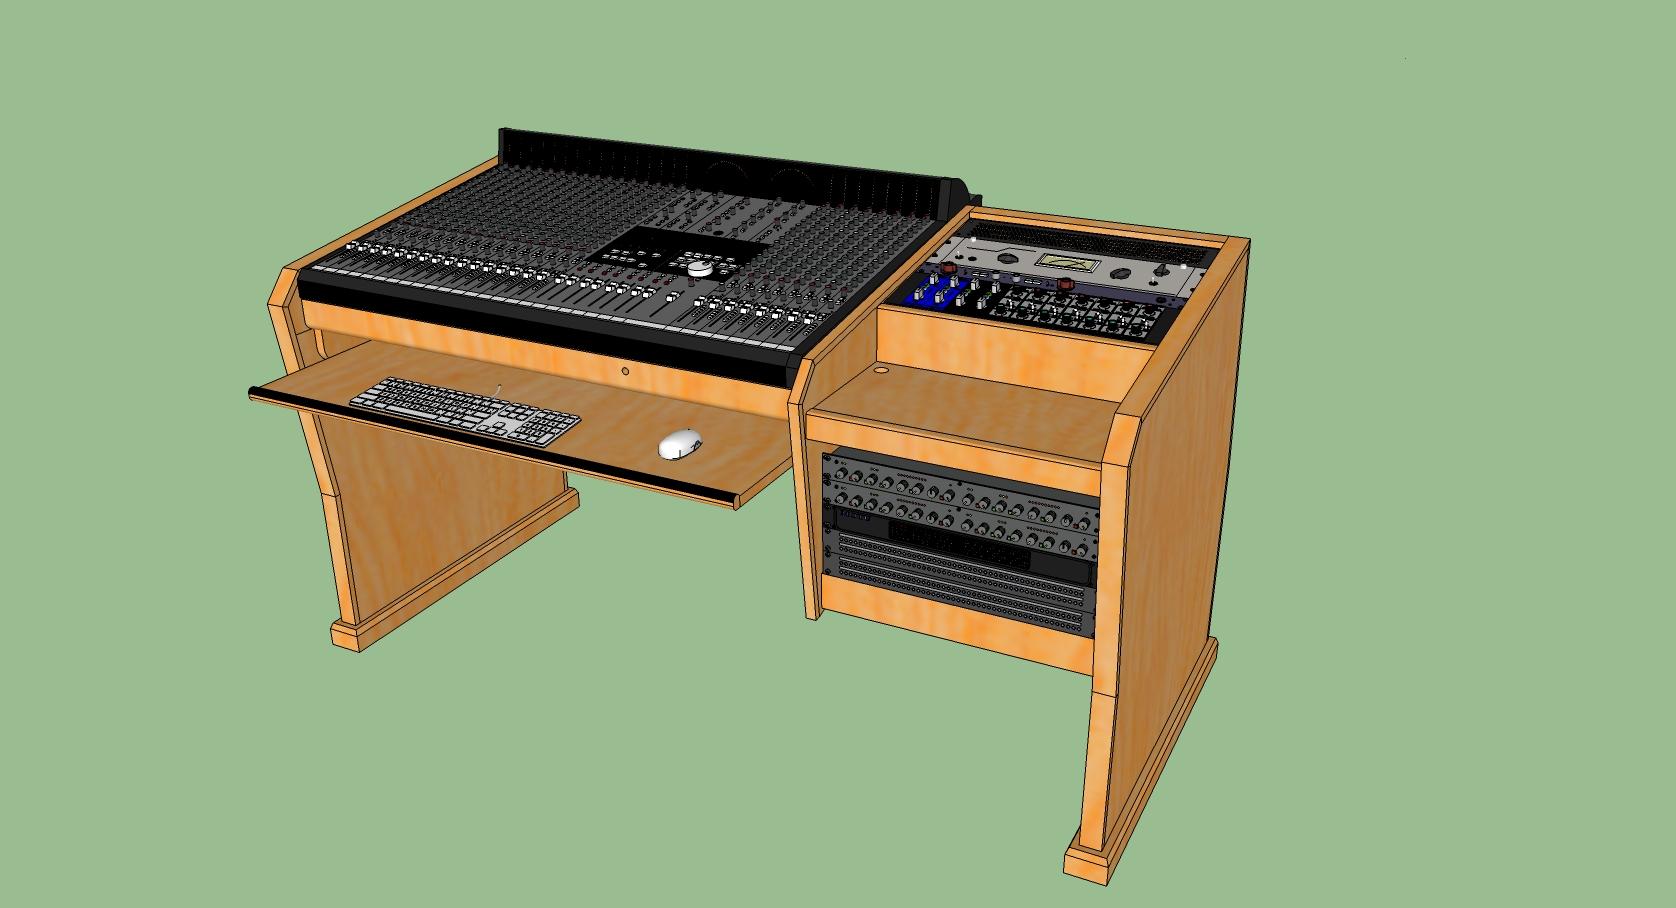 wooden desk design plans | woodproject